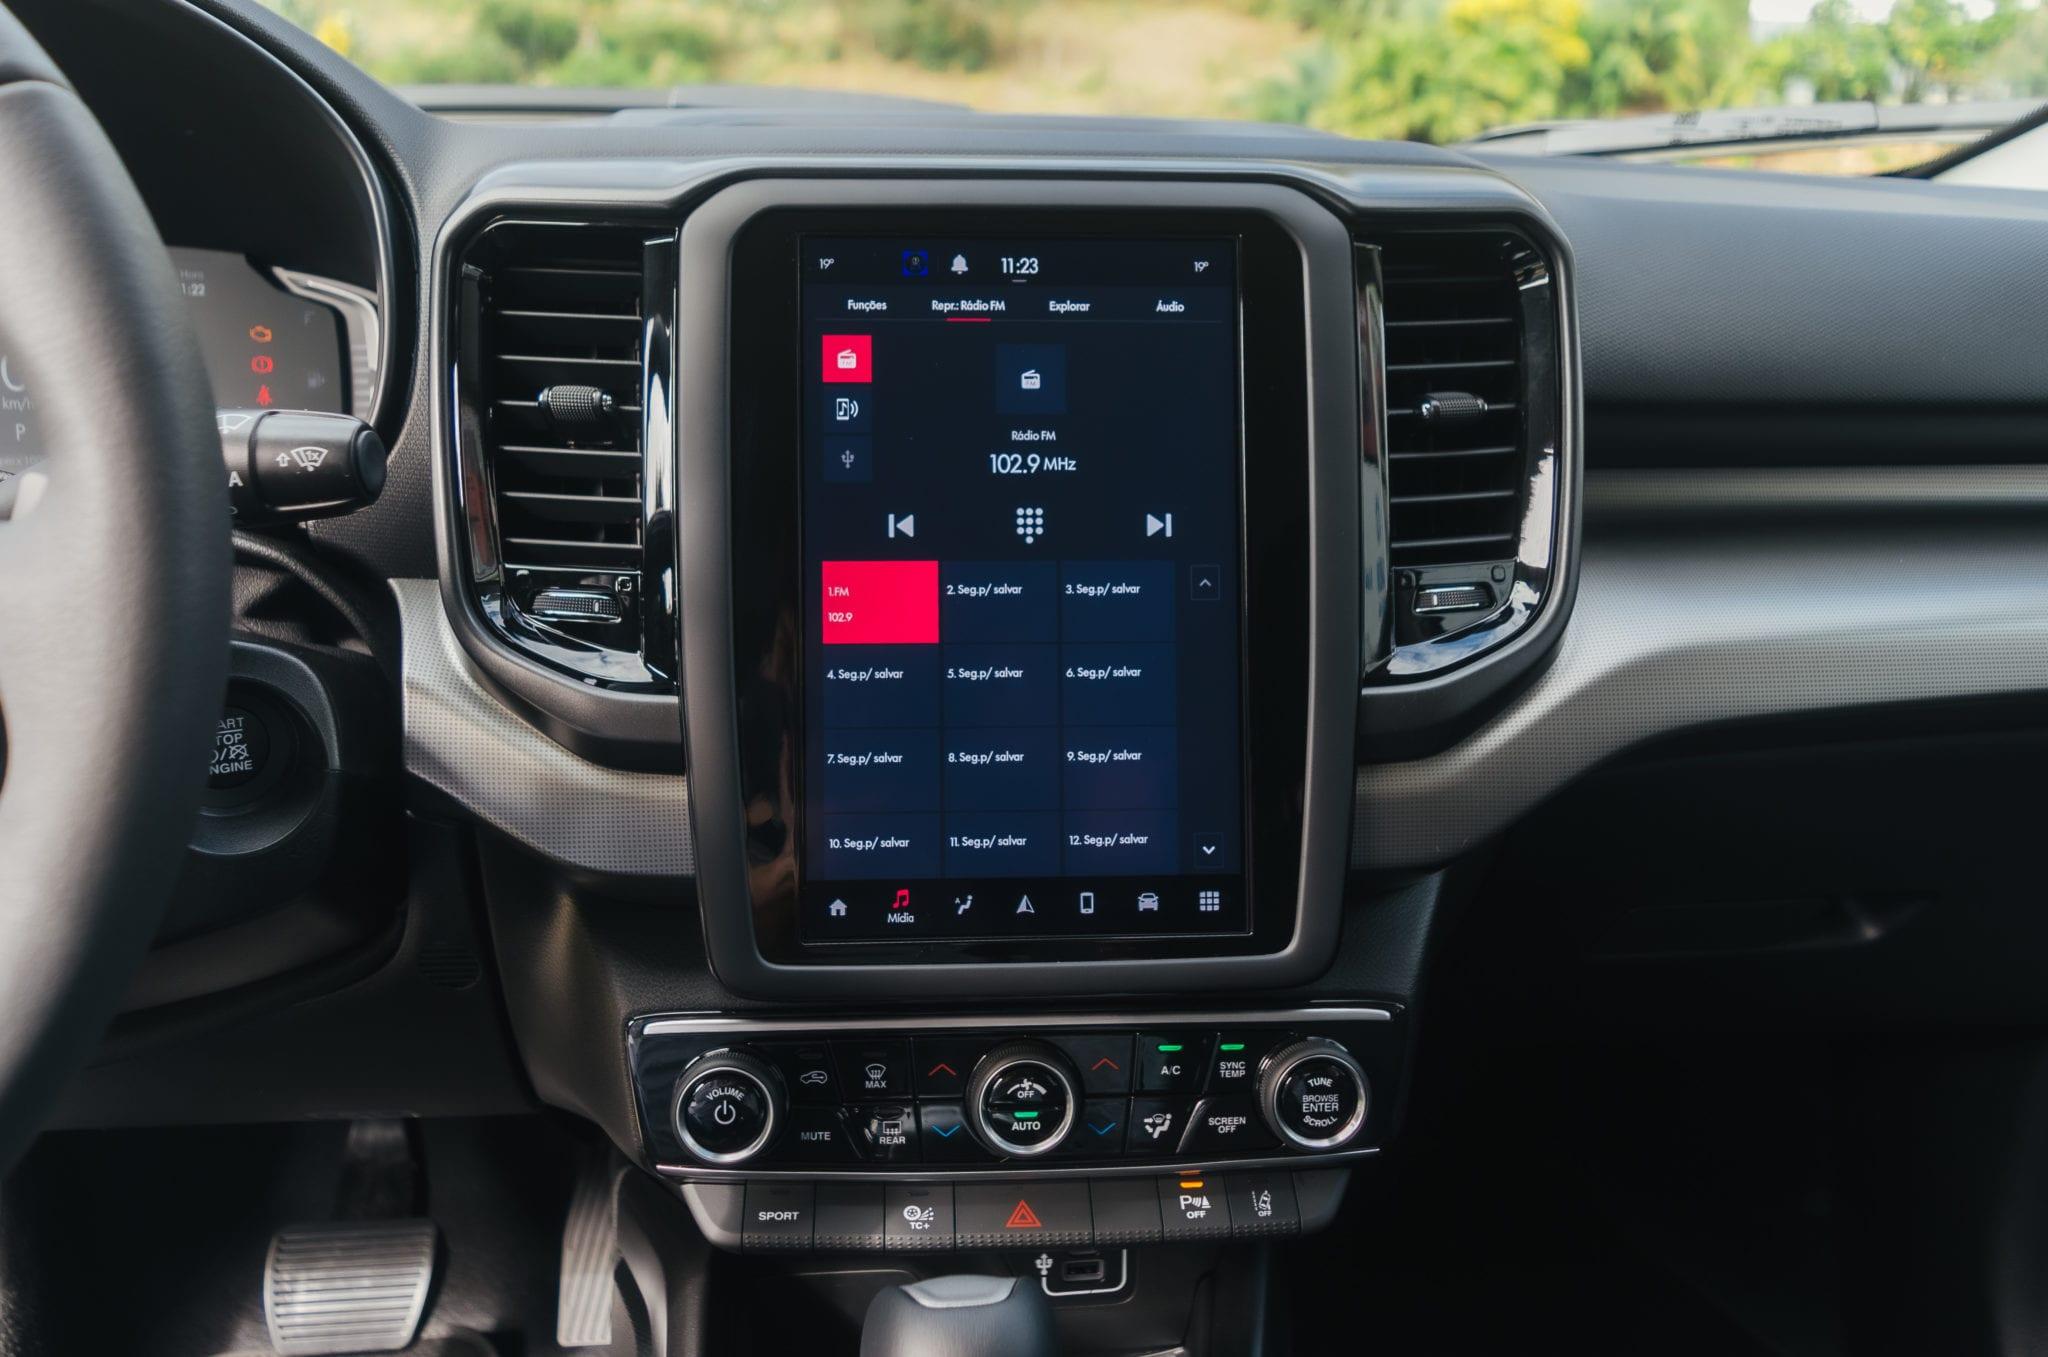 Venha conhecer a nova Fiat Toro 2022 na Carboni Fiat